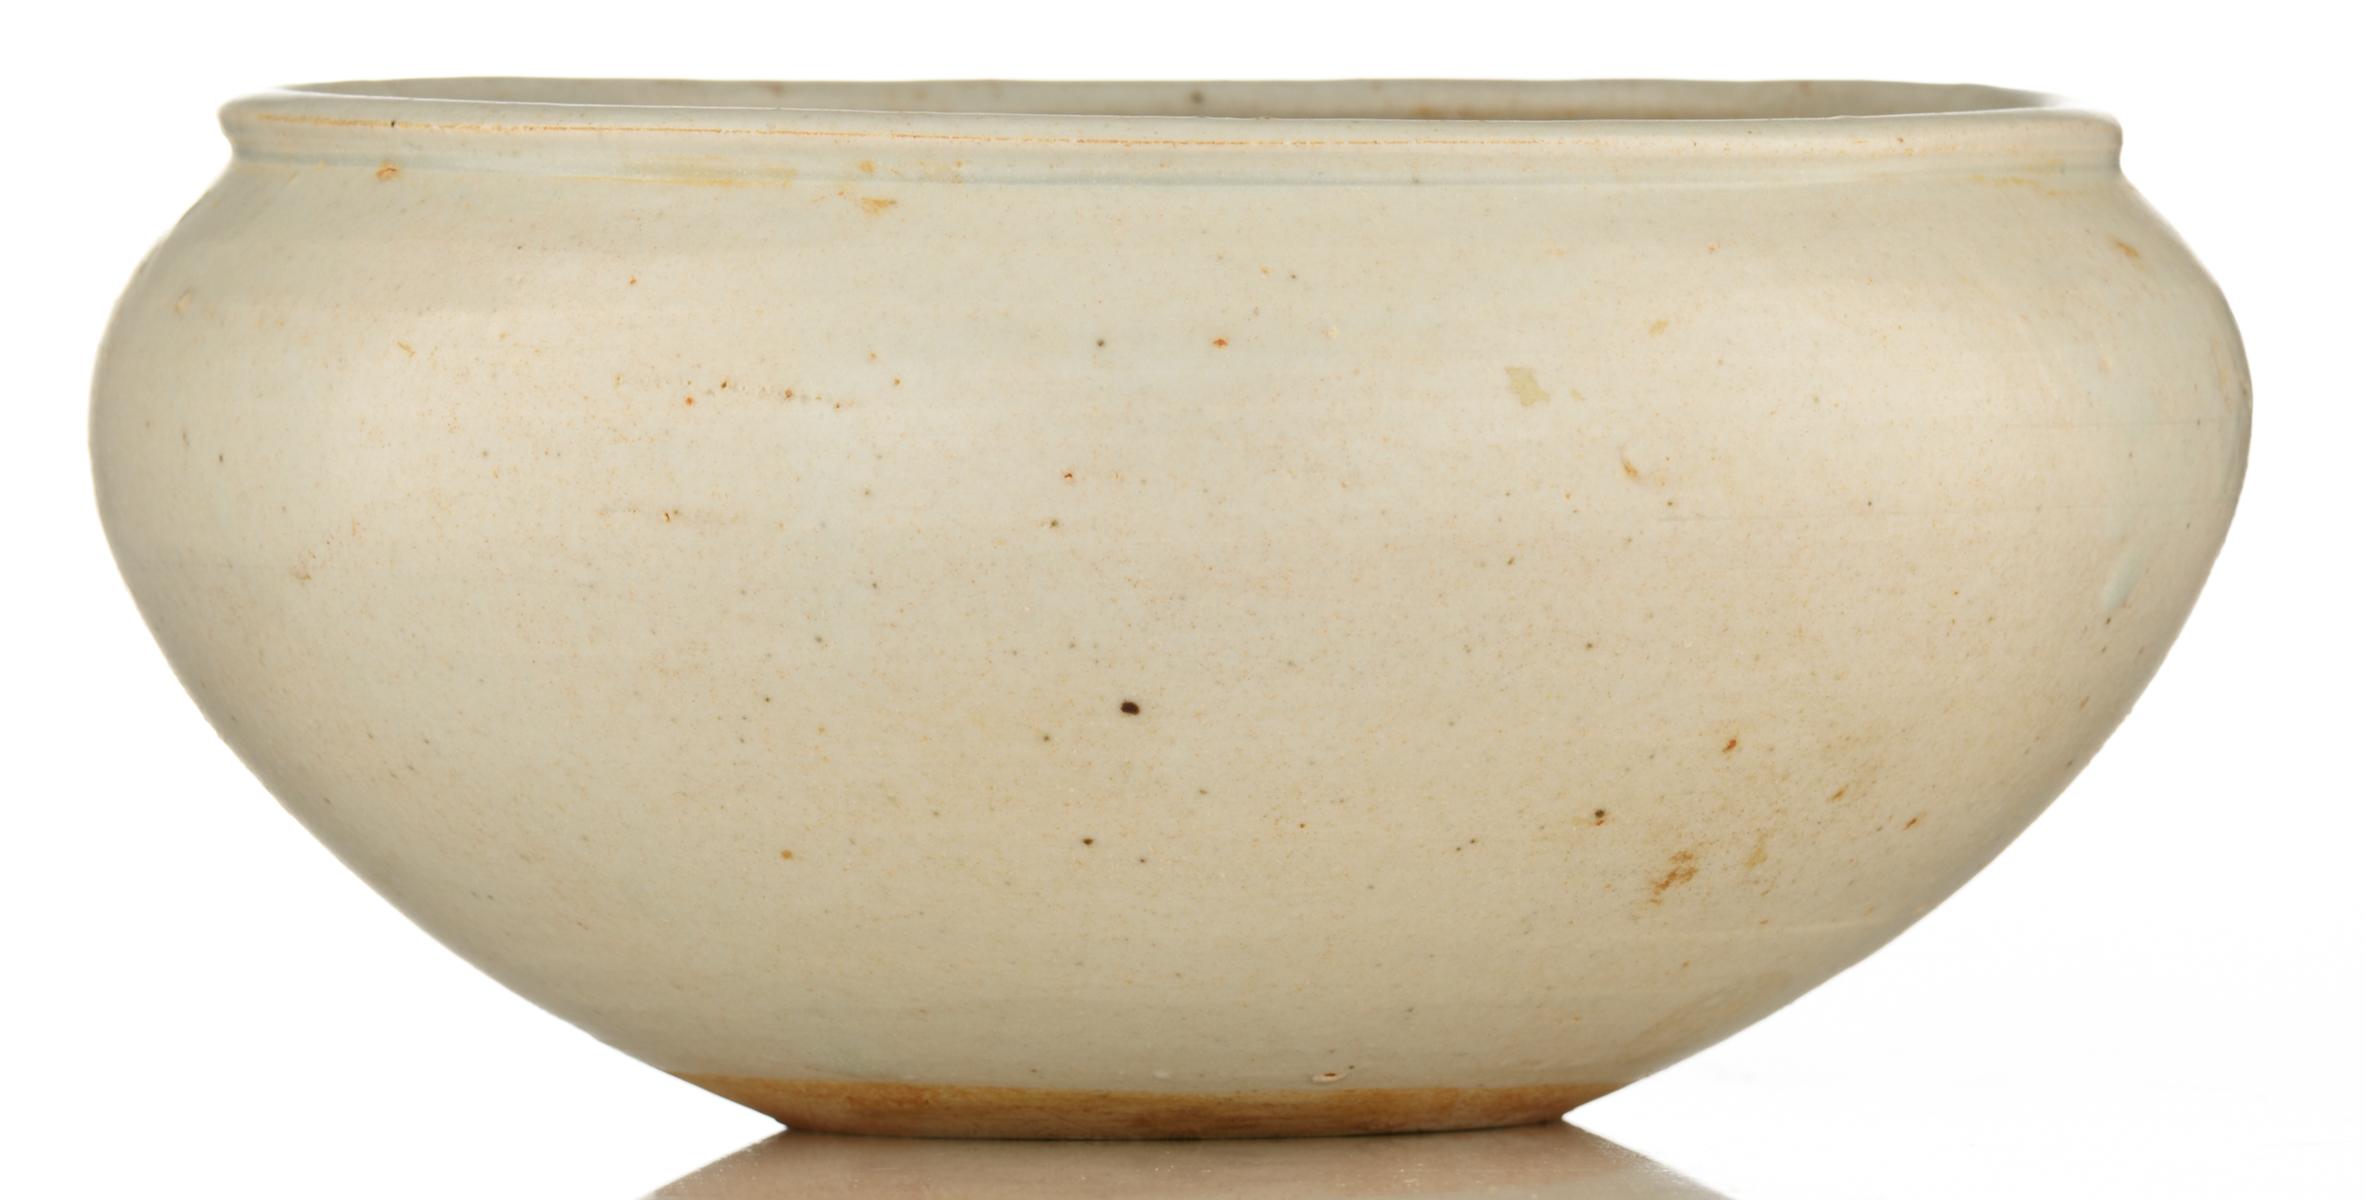 Lot 21 - An early Yue type bowl, H 8 - ø 16,5 cm